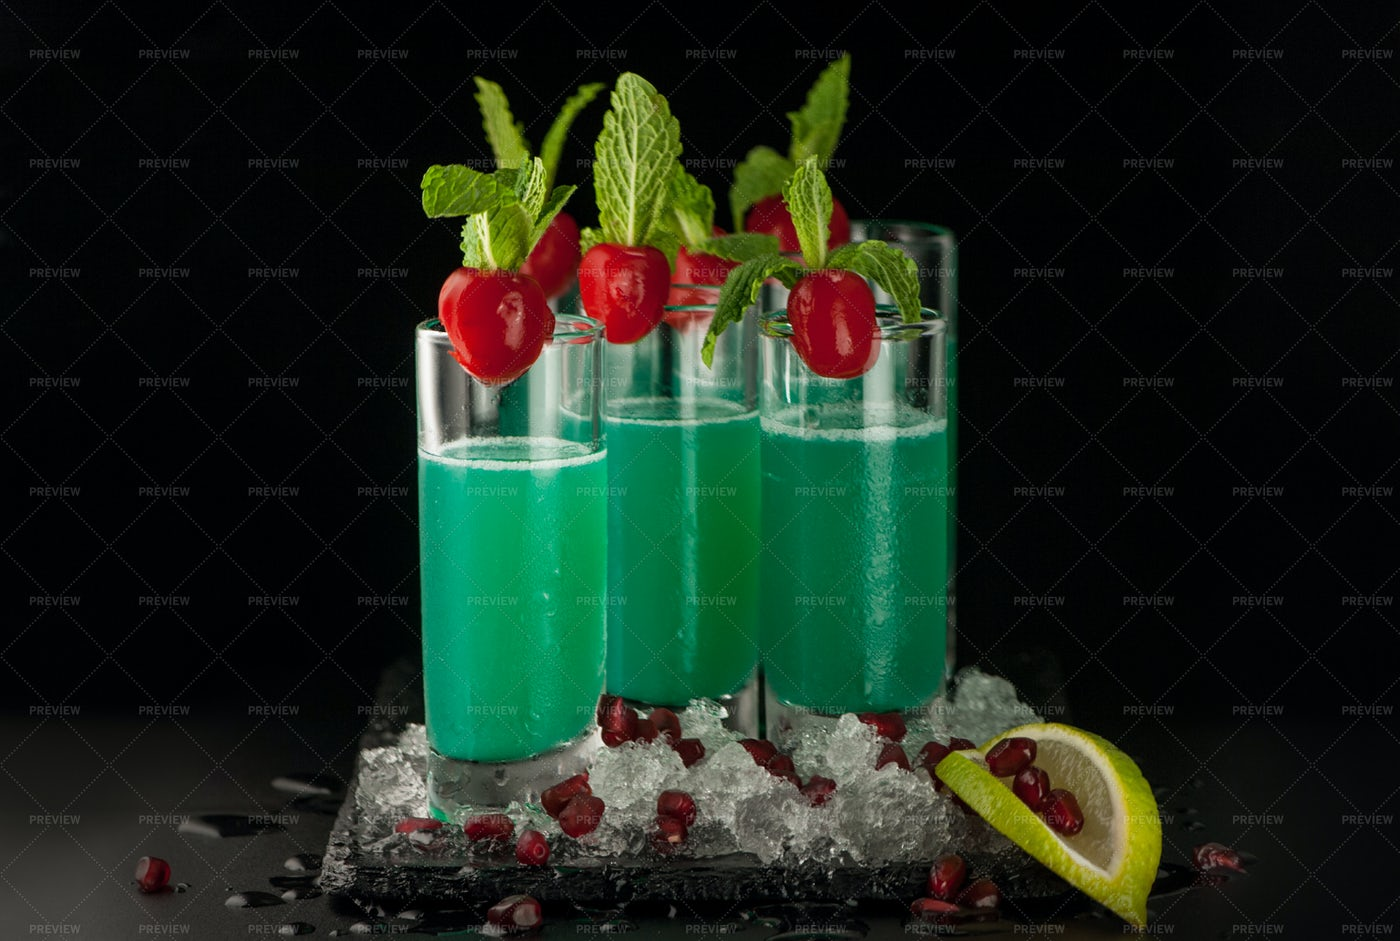 Green Drinks: Stock Photos